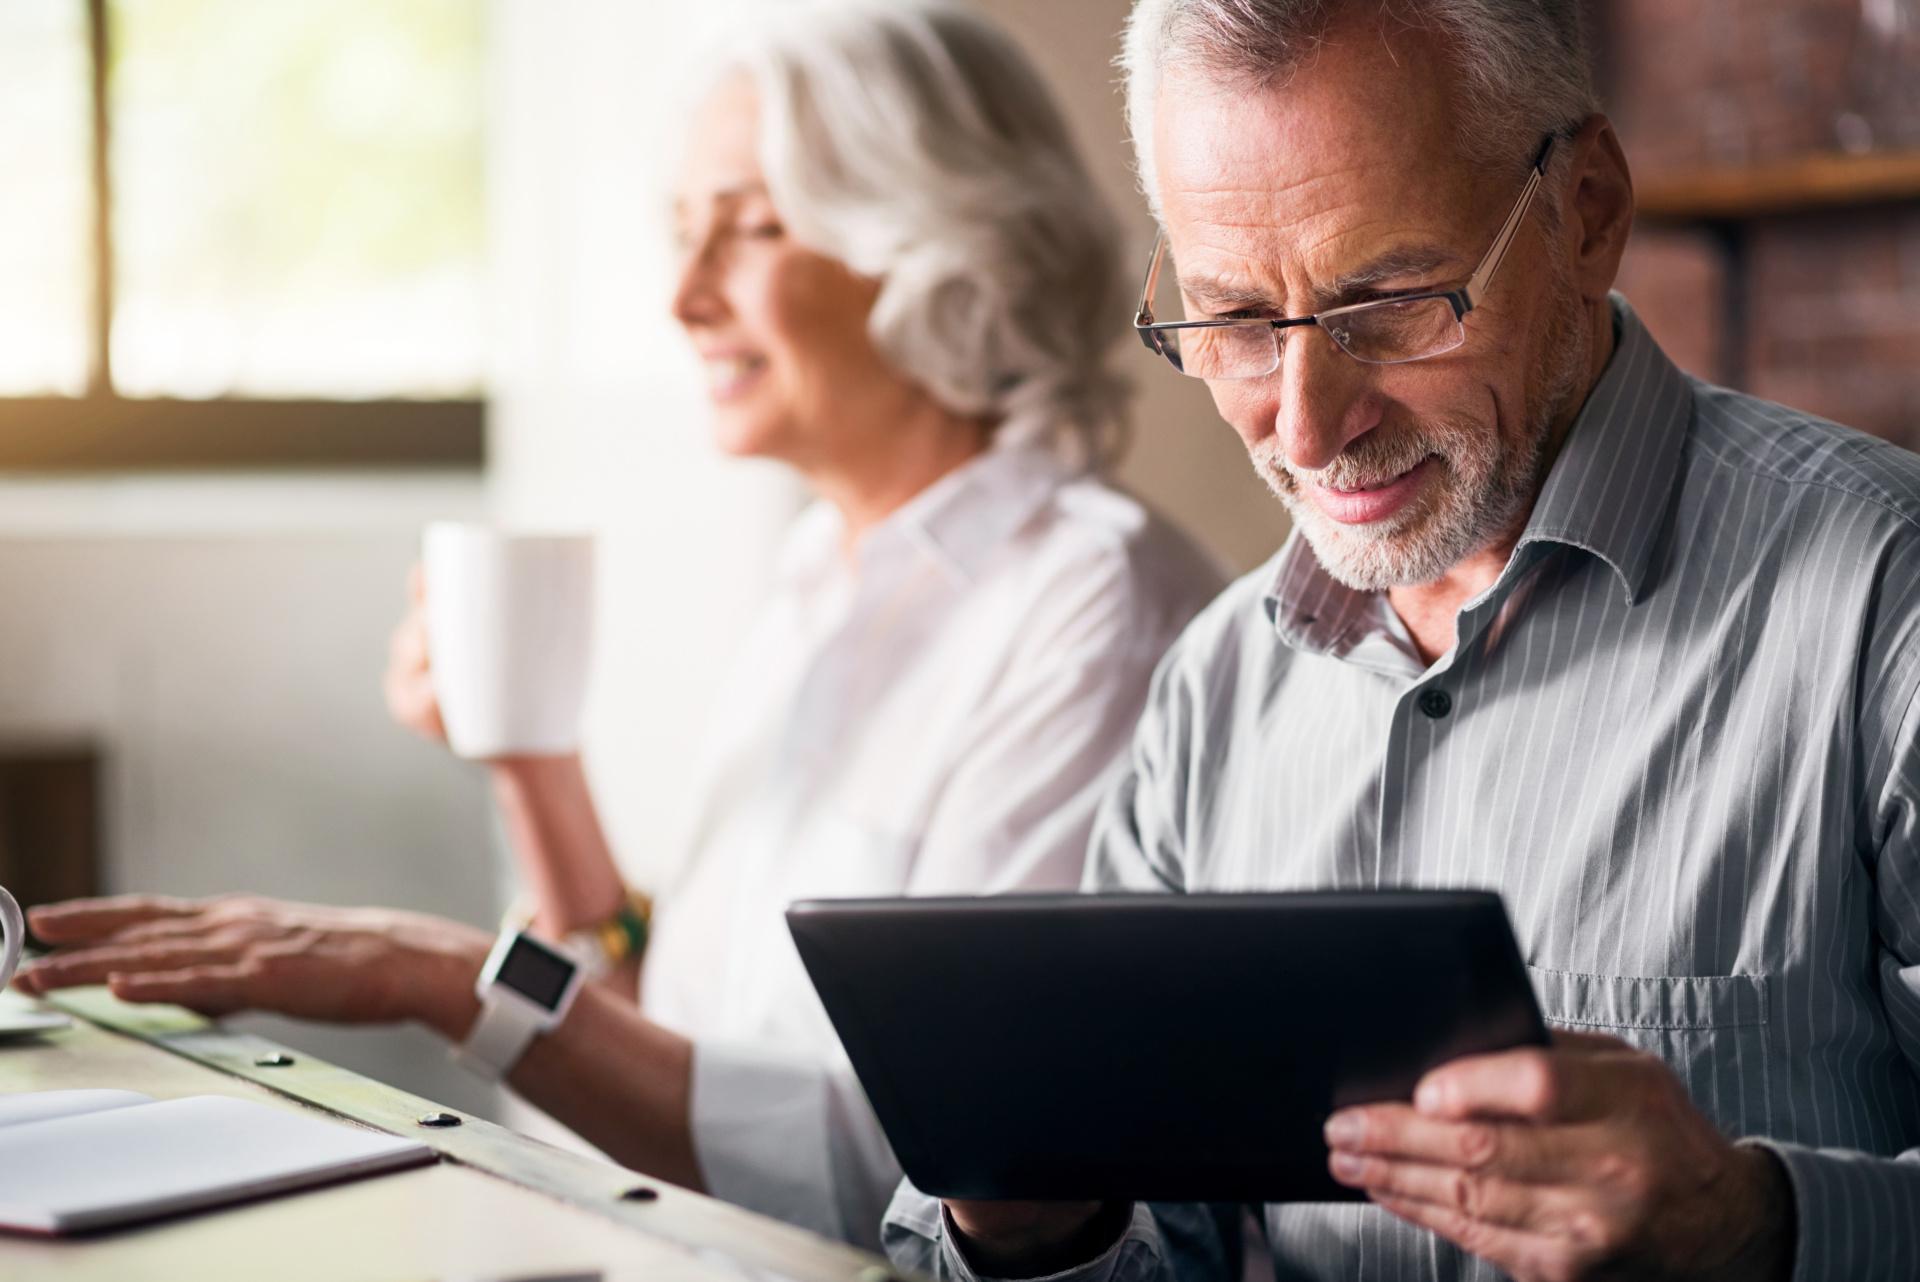 Help People Work Longer by Phasing Retirement